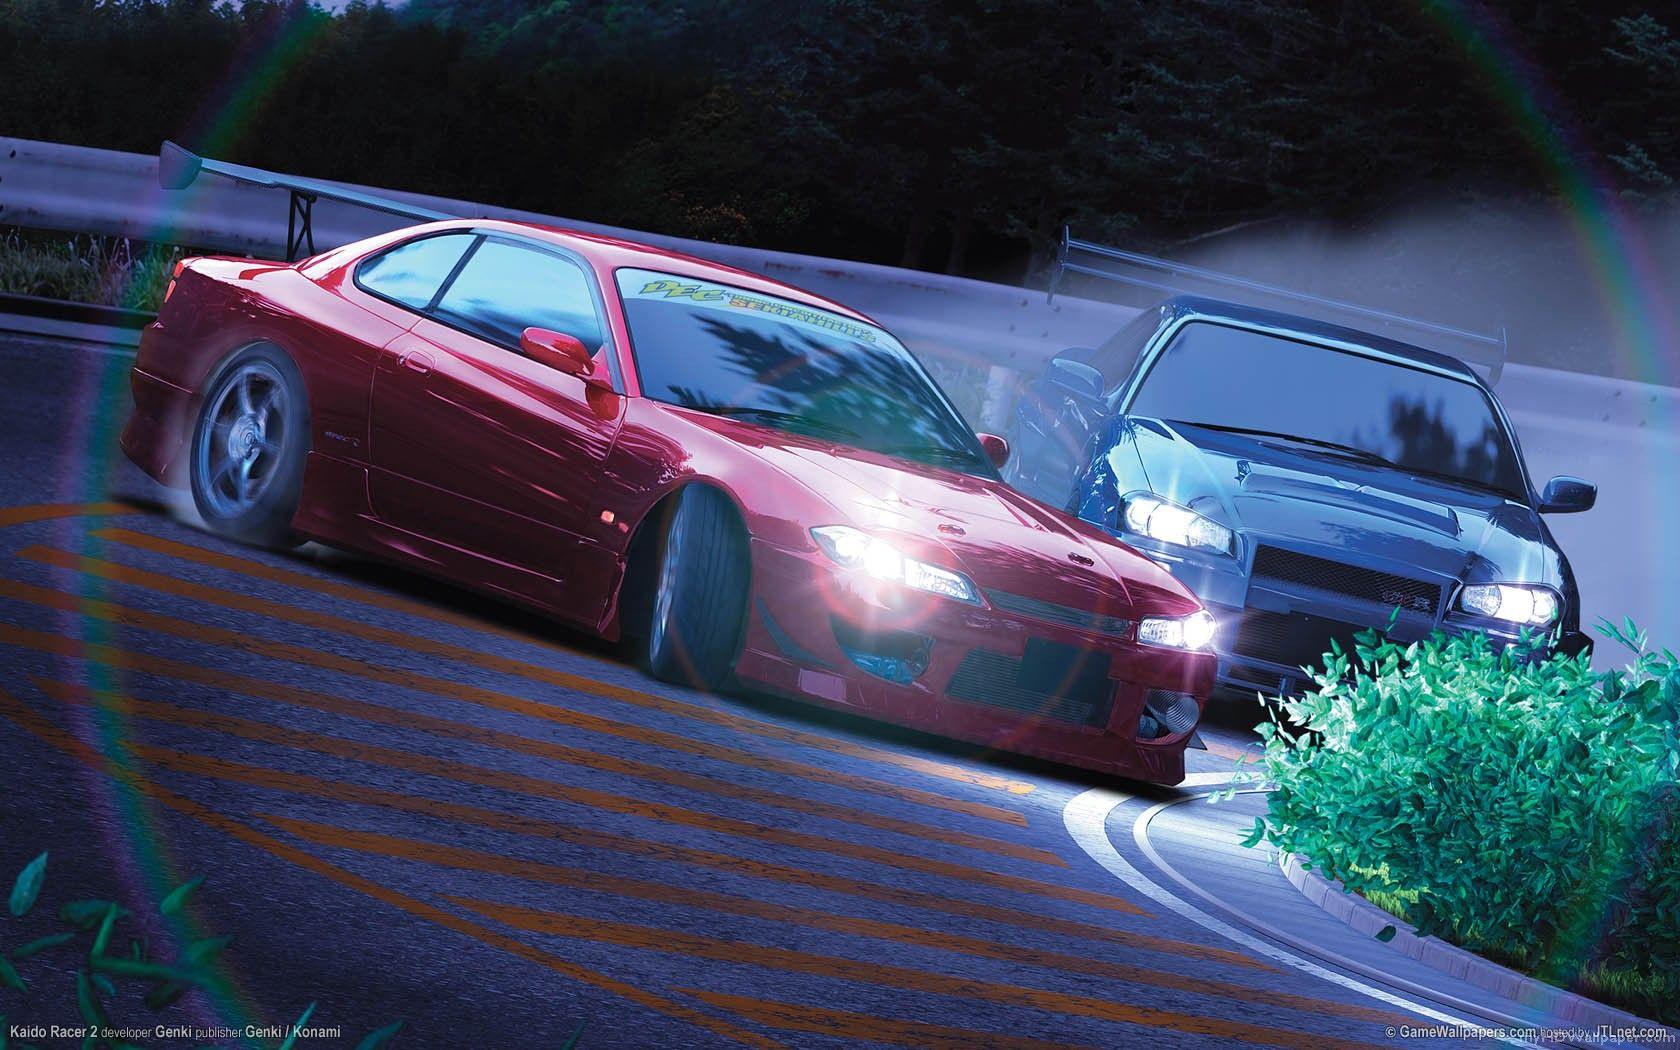 The Art Of Drifting Carros Carros Esportivos Of Wallpaper